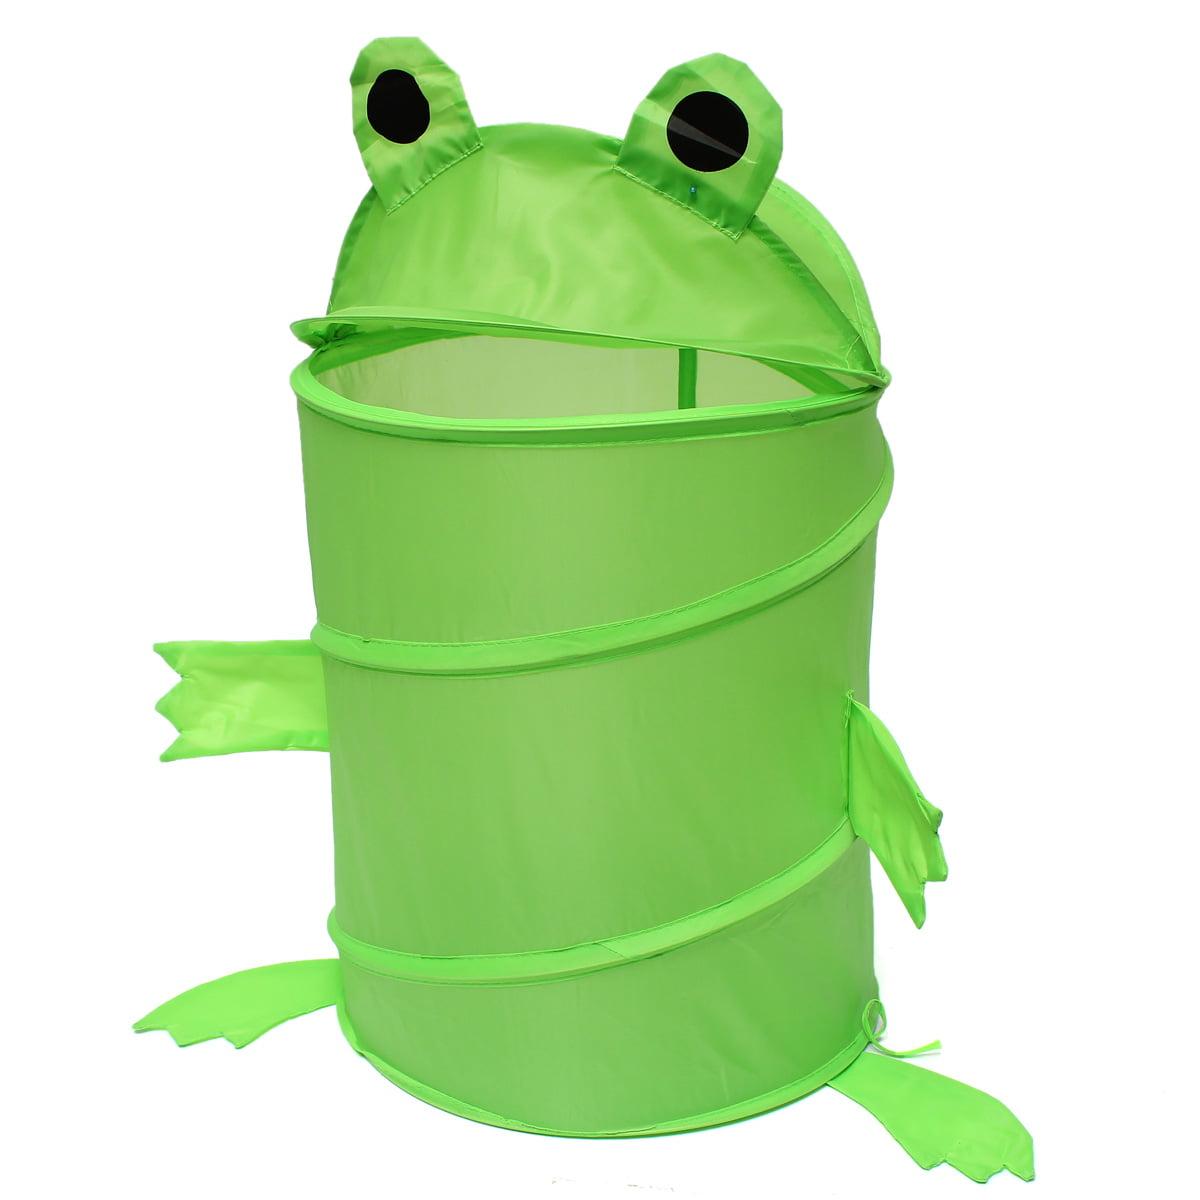 Kids Foldable Laundry Hamper Pop Up Animal Laundry Basket Bag Toys Storage Dirty Washing Clothes & Toy Storage Organizer